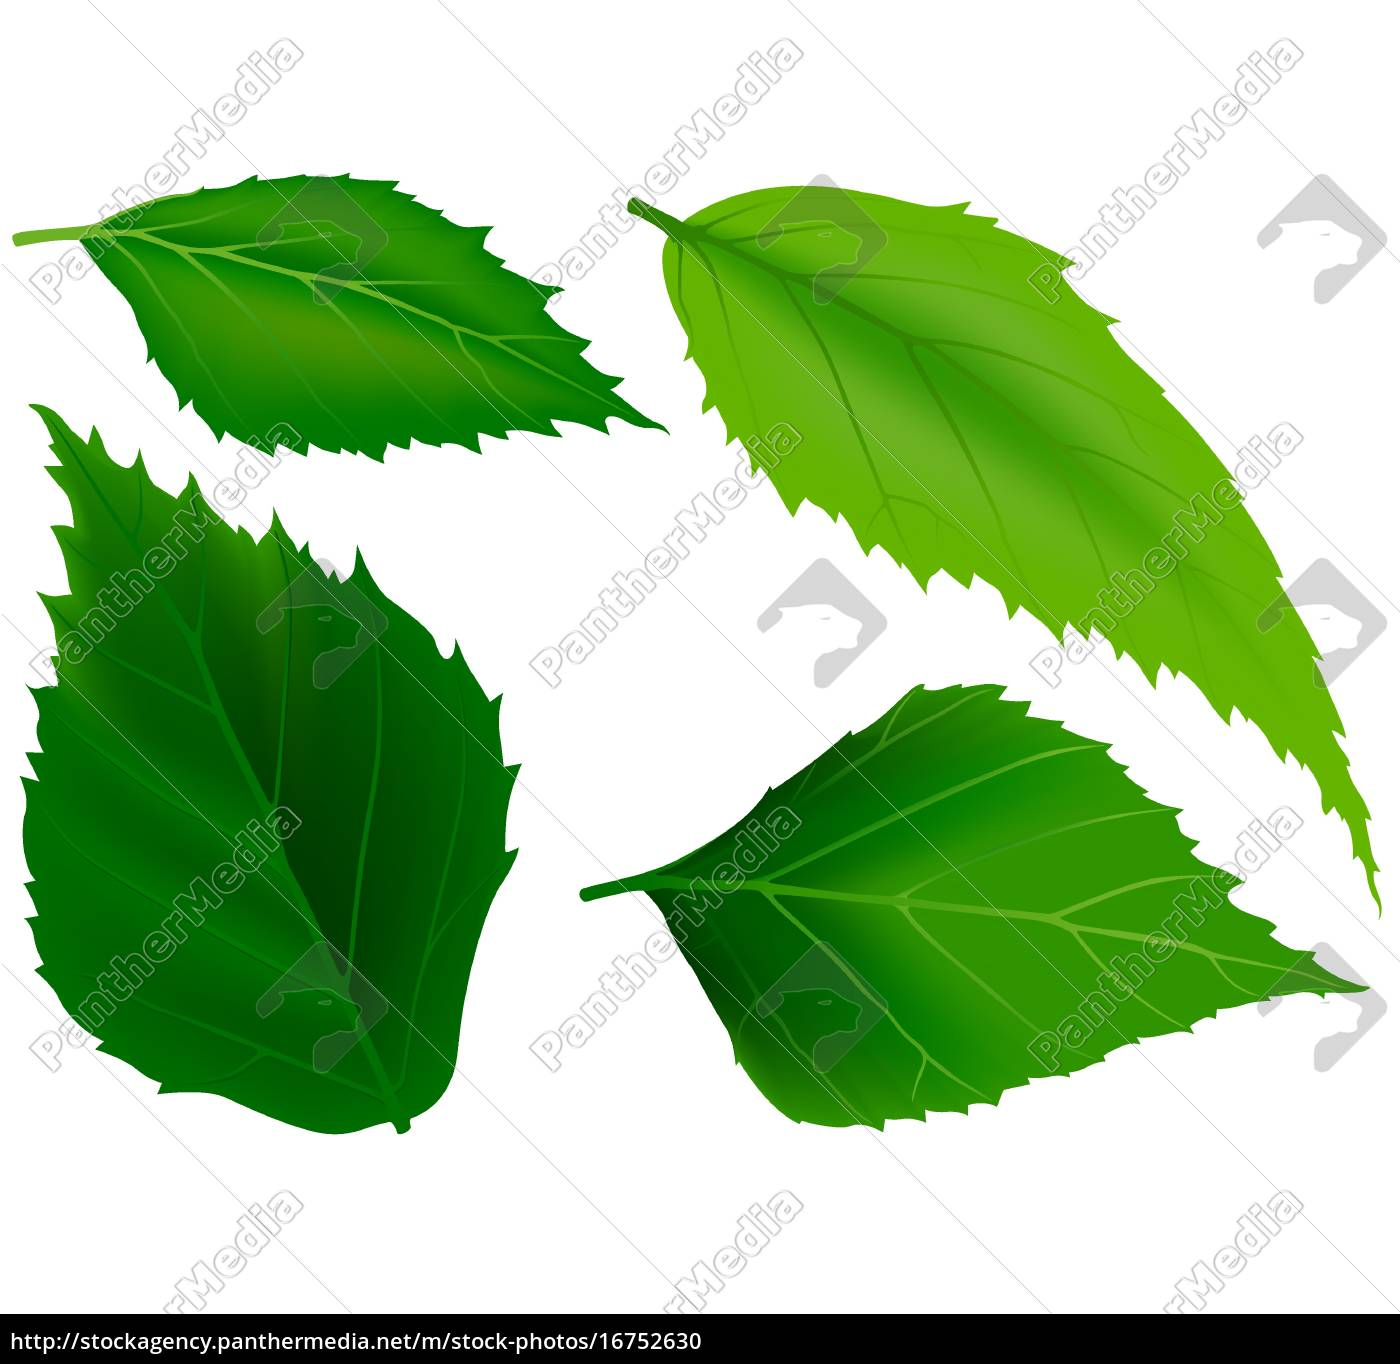 grüne, blätter - 16752630